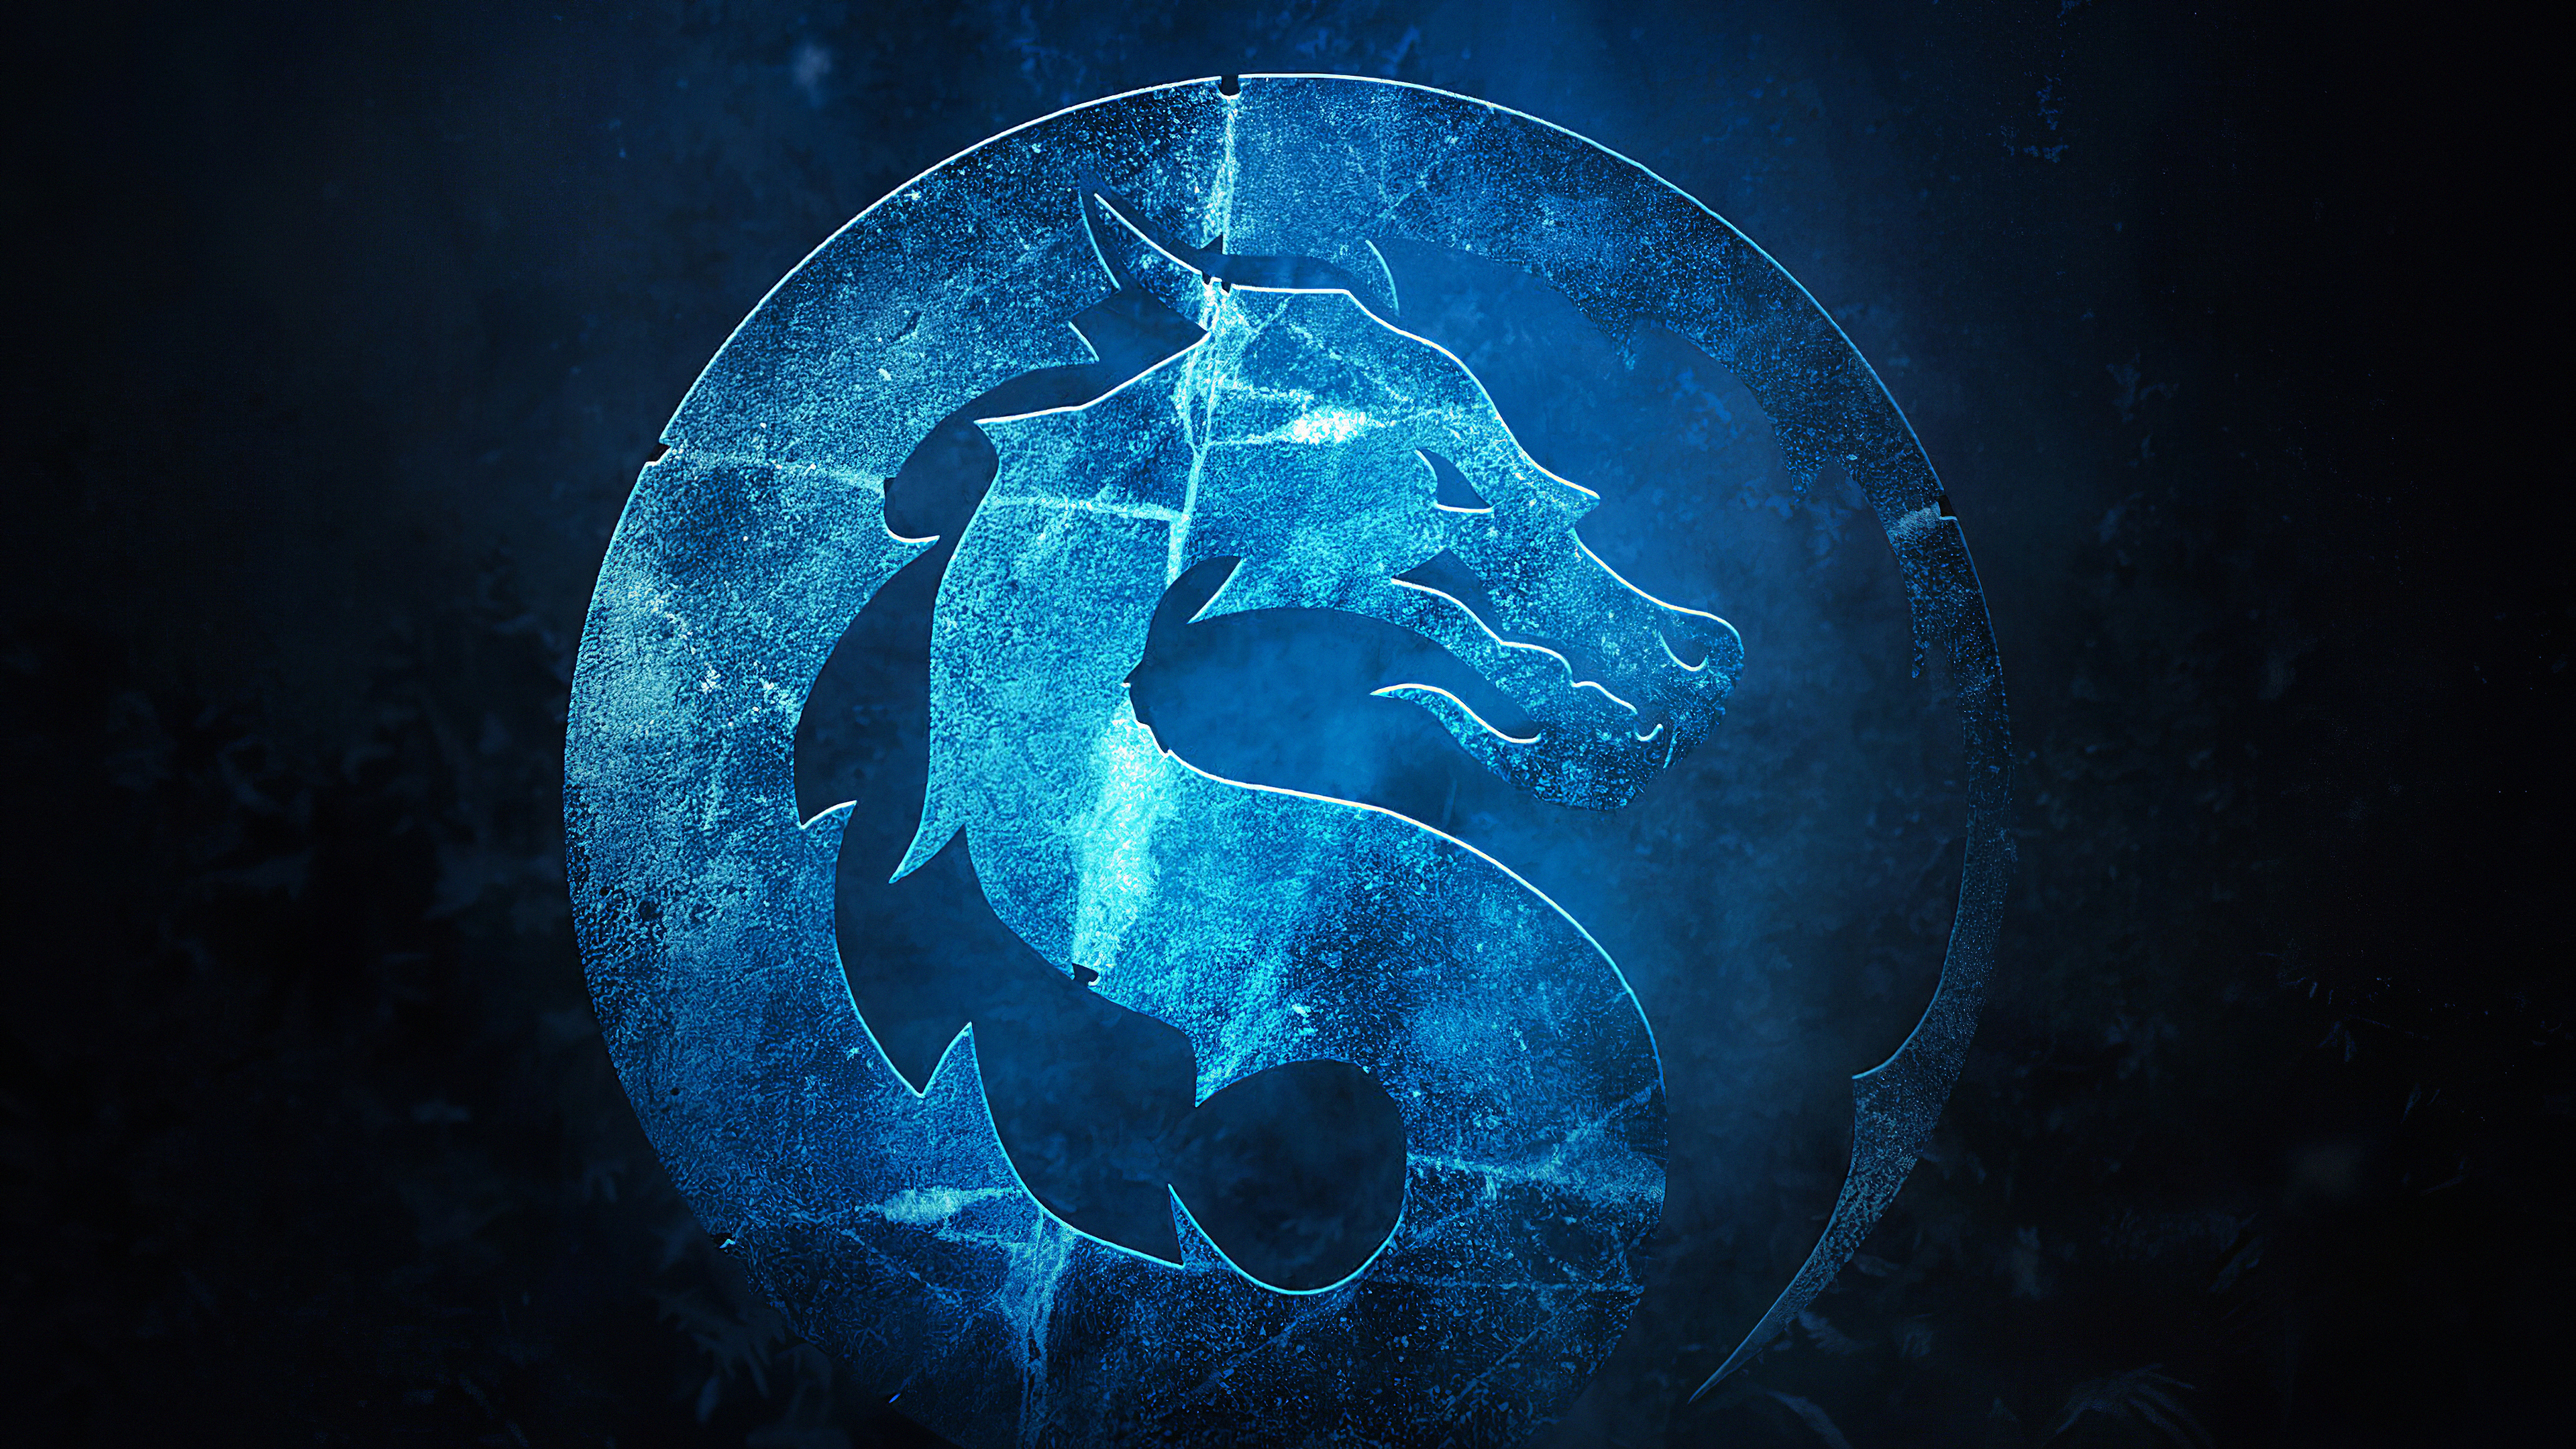 Mortal Kombat Sub Zero Corruption 4k Hd Games 4k Wallpapers